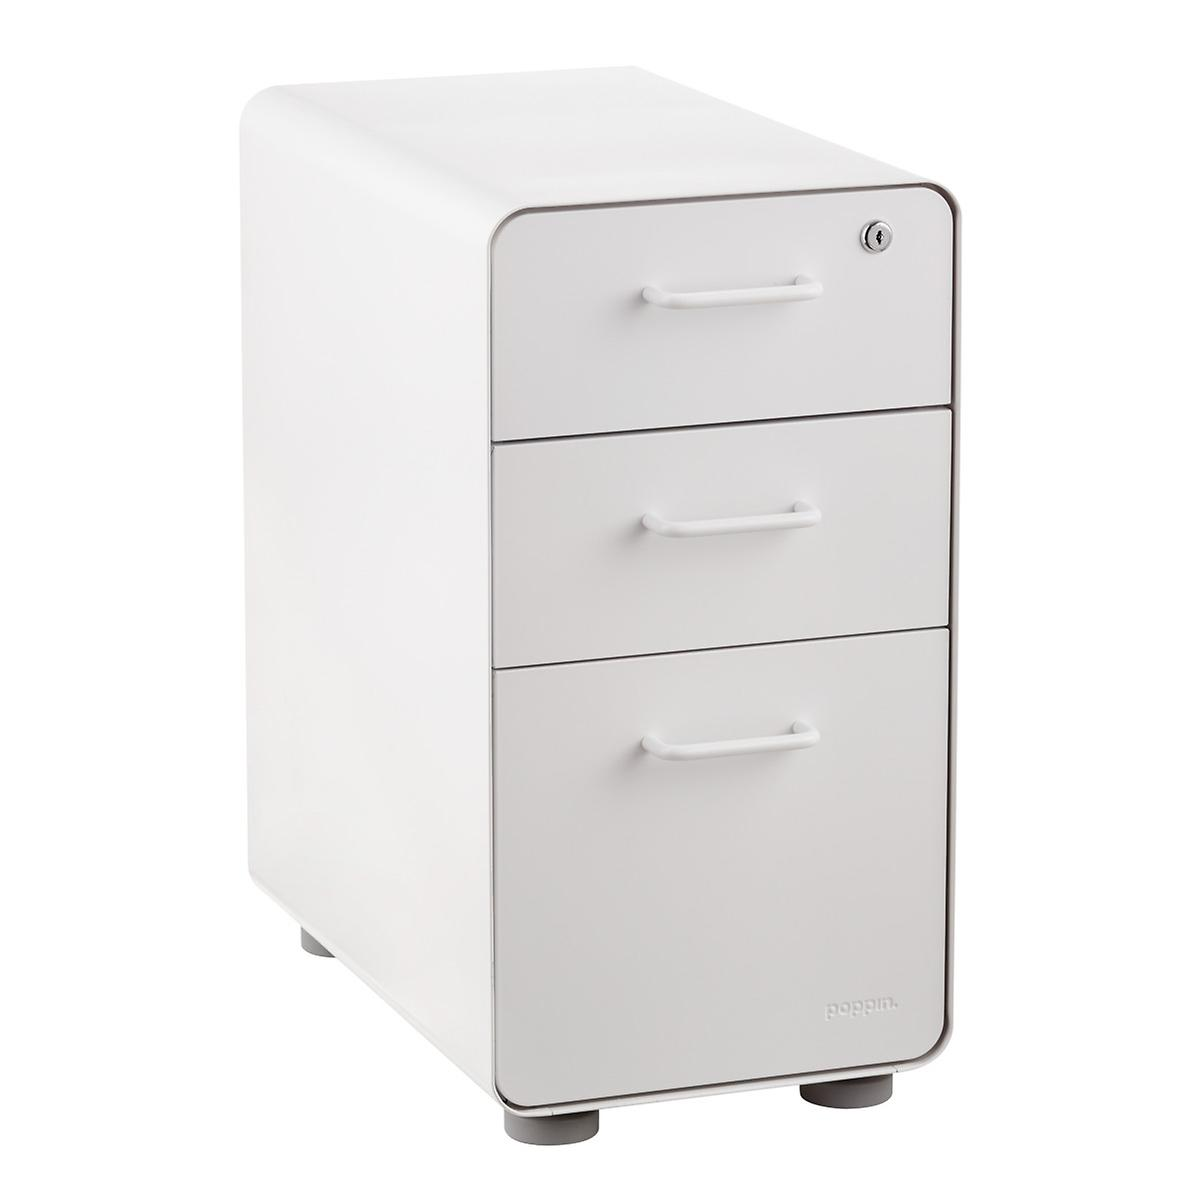 d253c35e9b1 Poppin White Slim 3-Drawer Stow Filing Cabinet